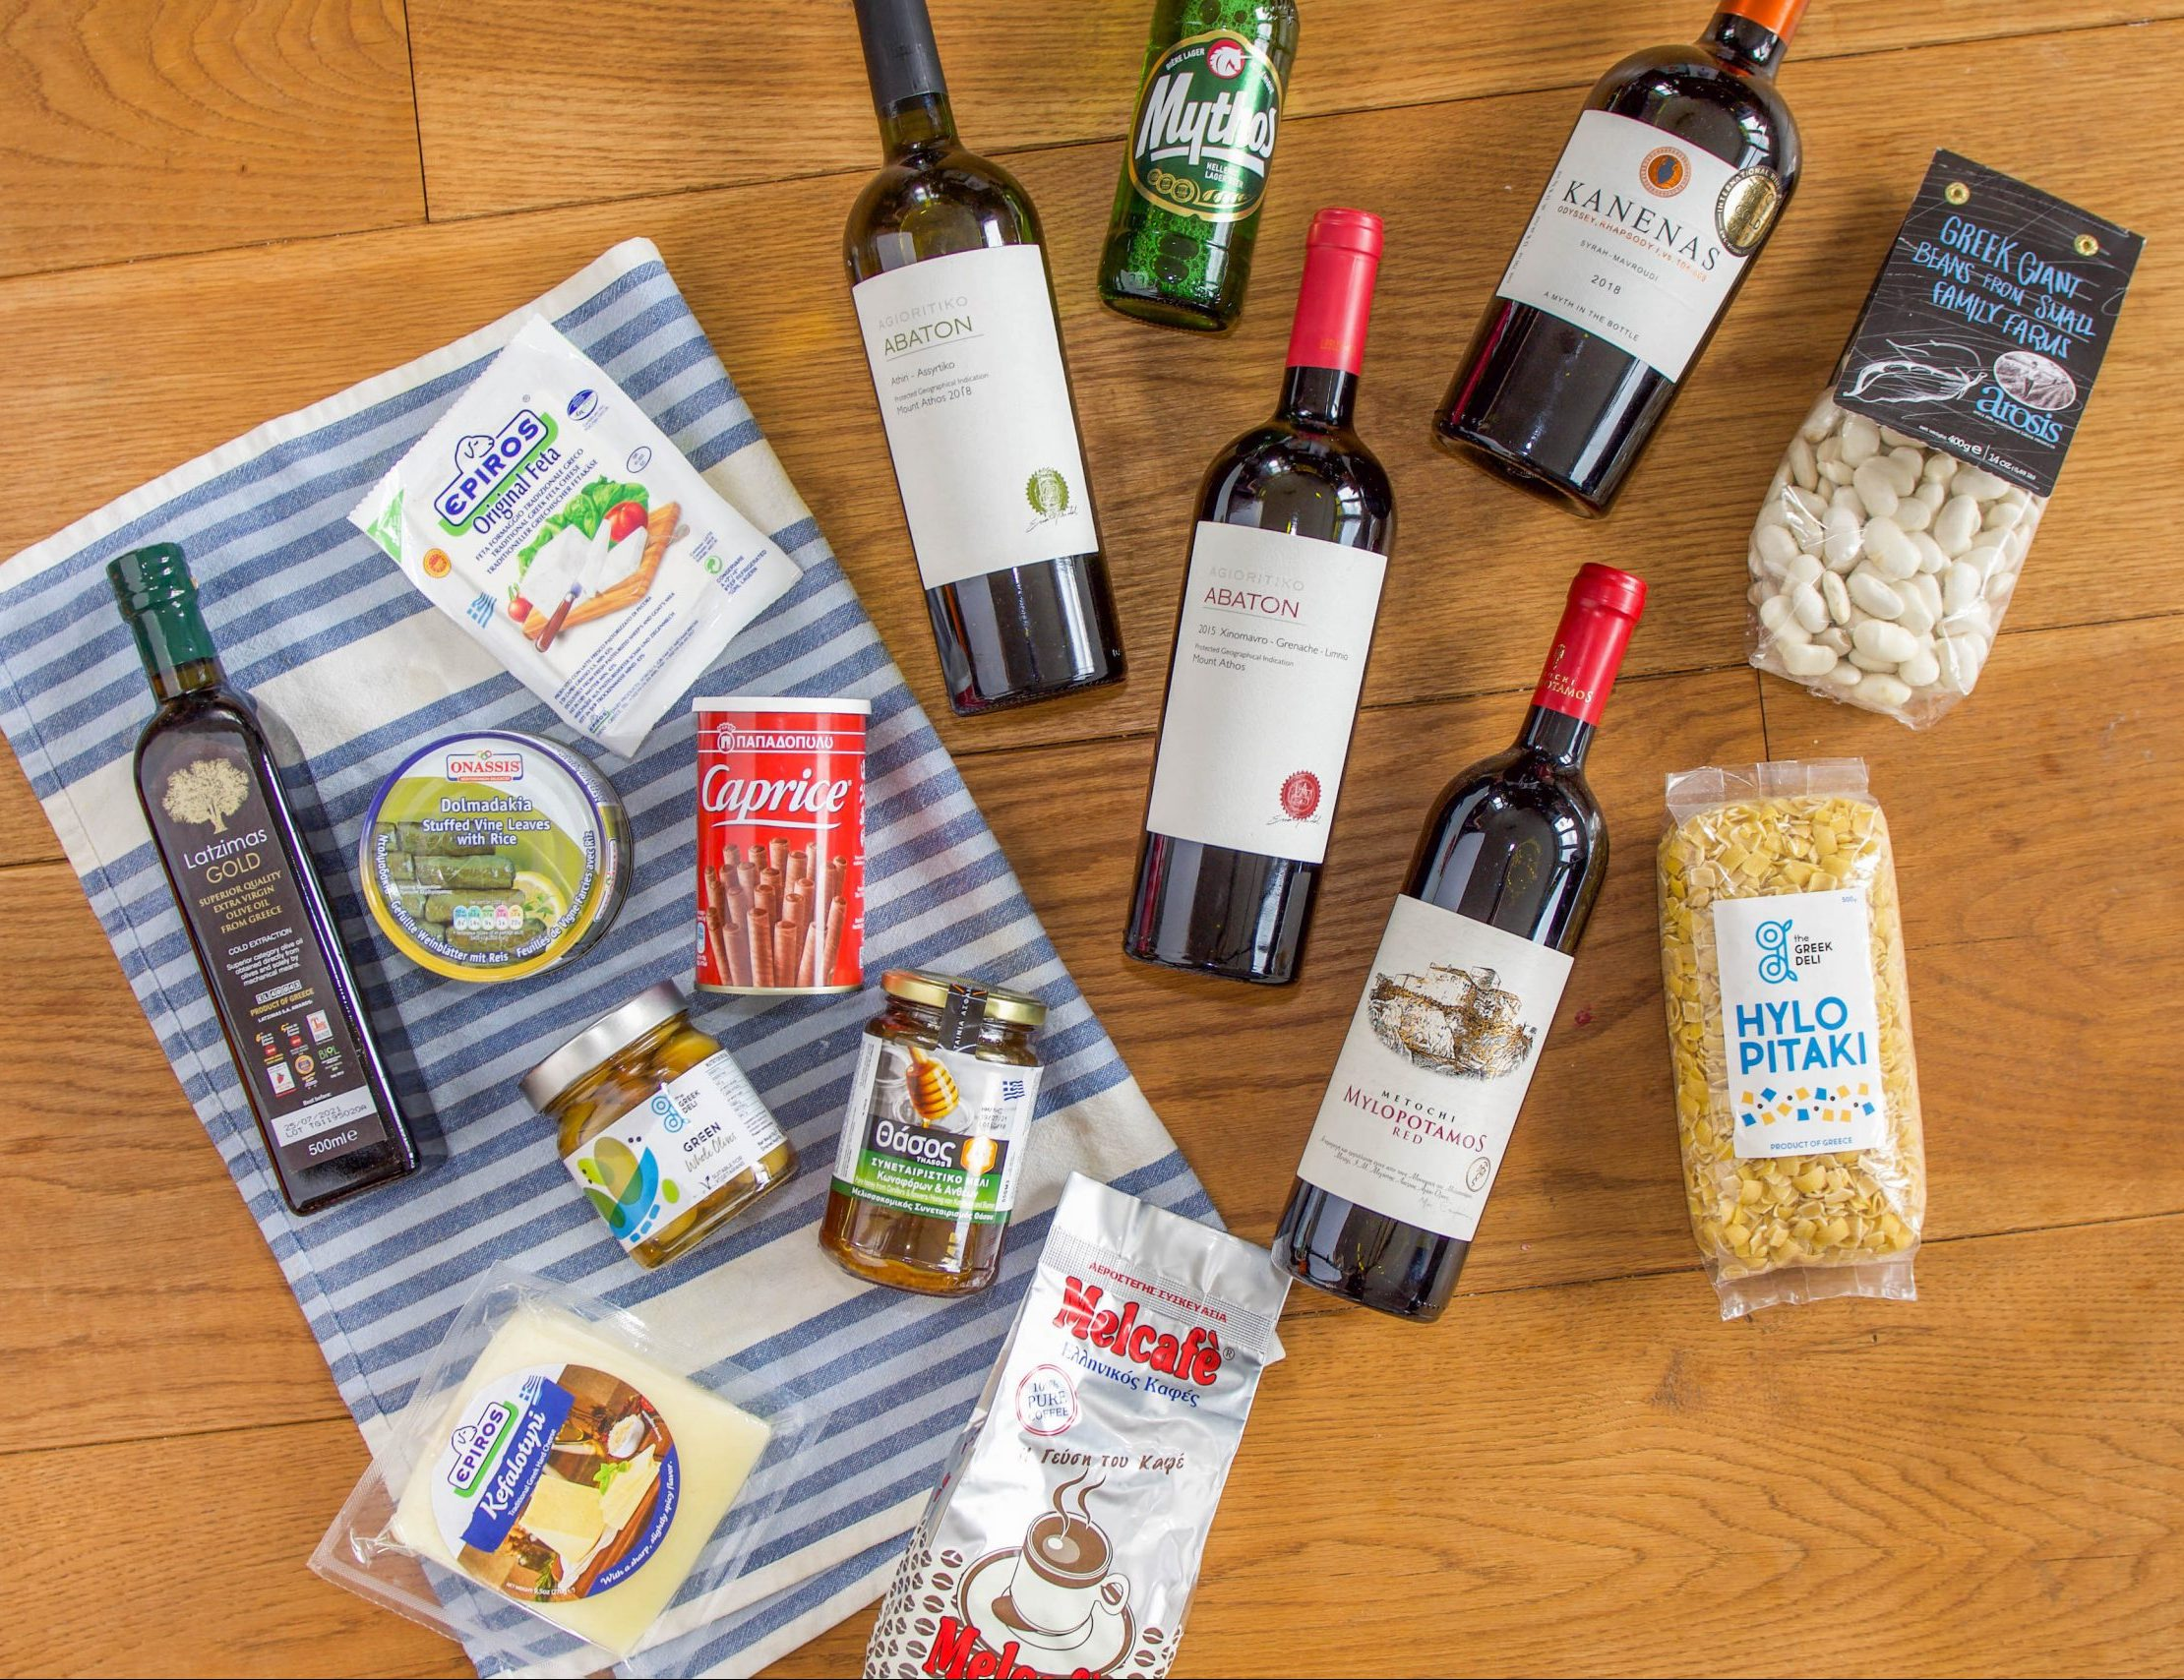 The Real Greek Shop - Greek Wine - Produce - Greek Olive Oil - Dolmades - Coffe